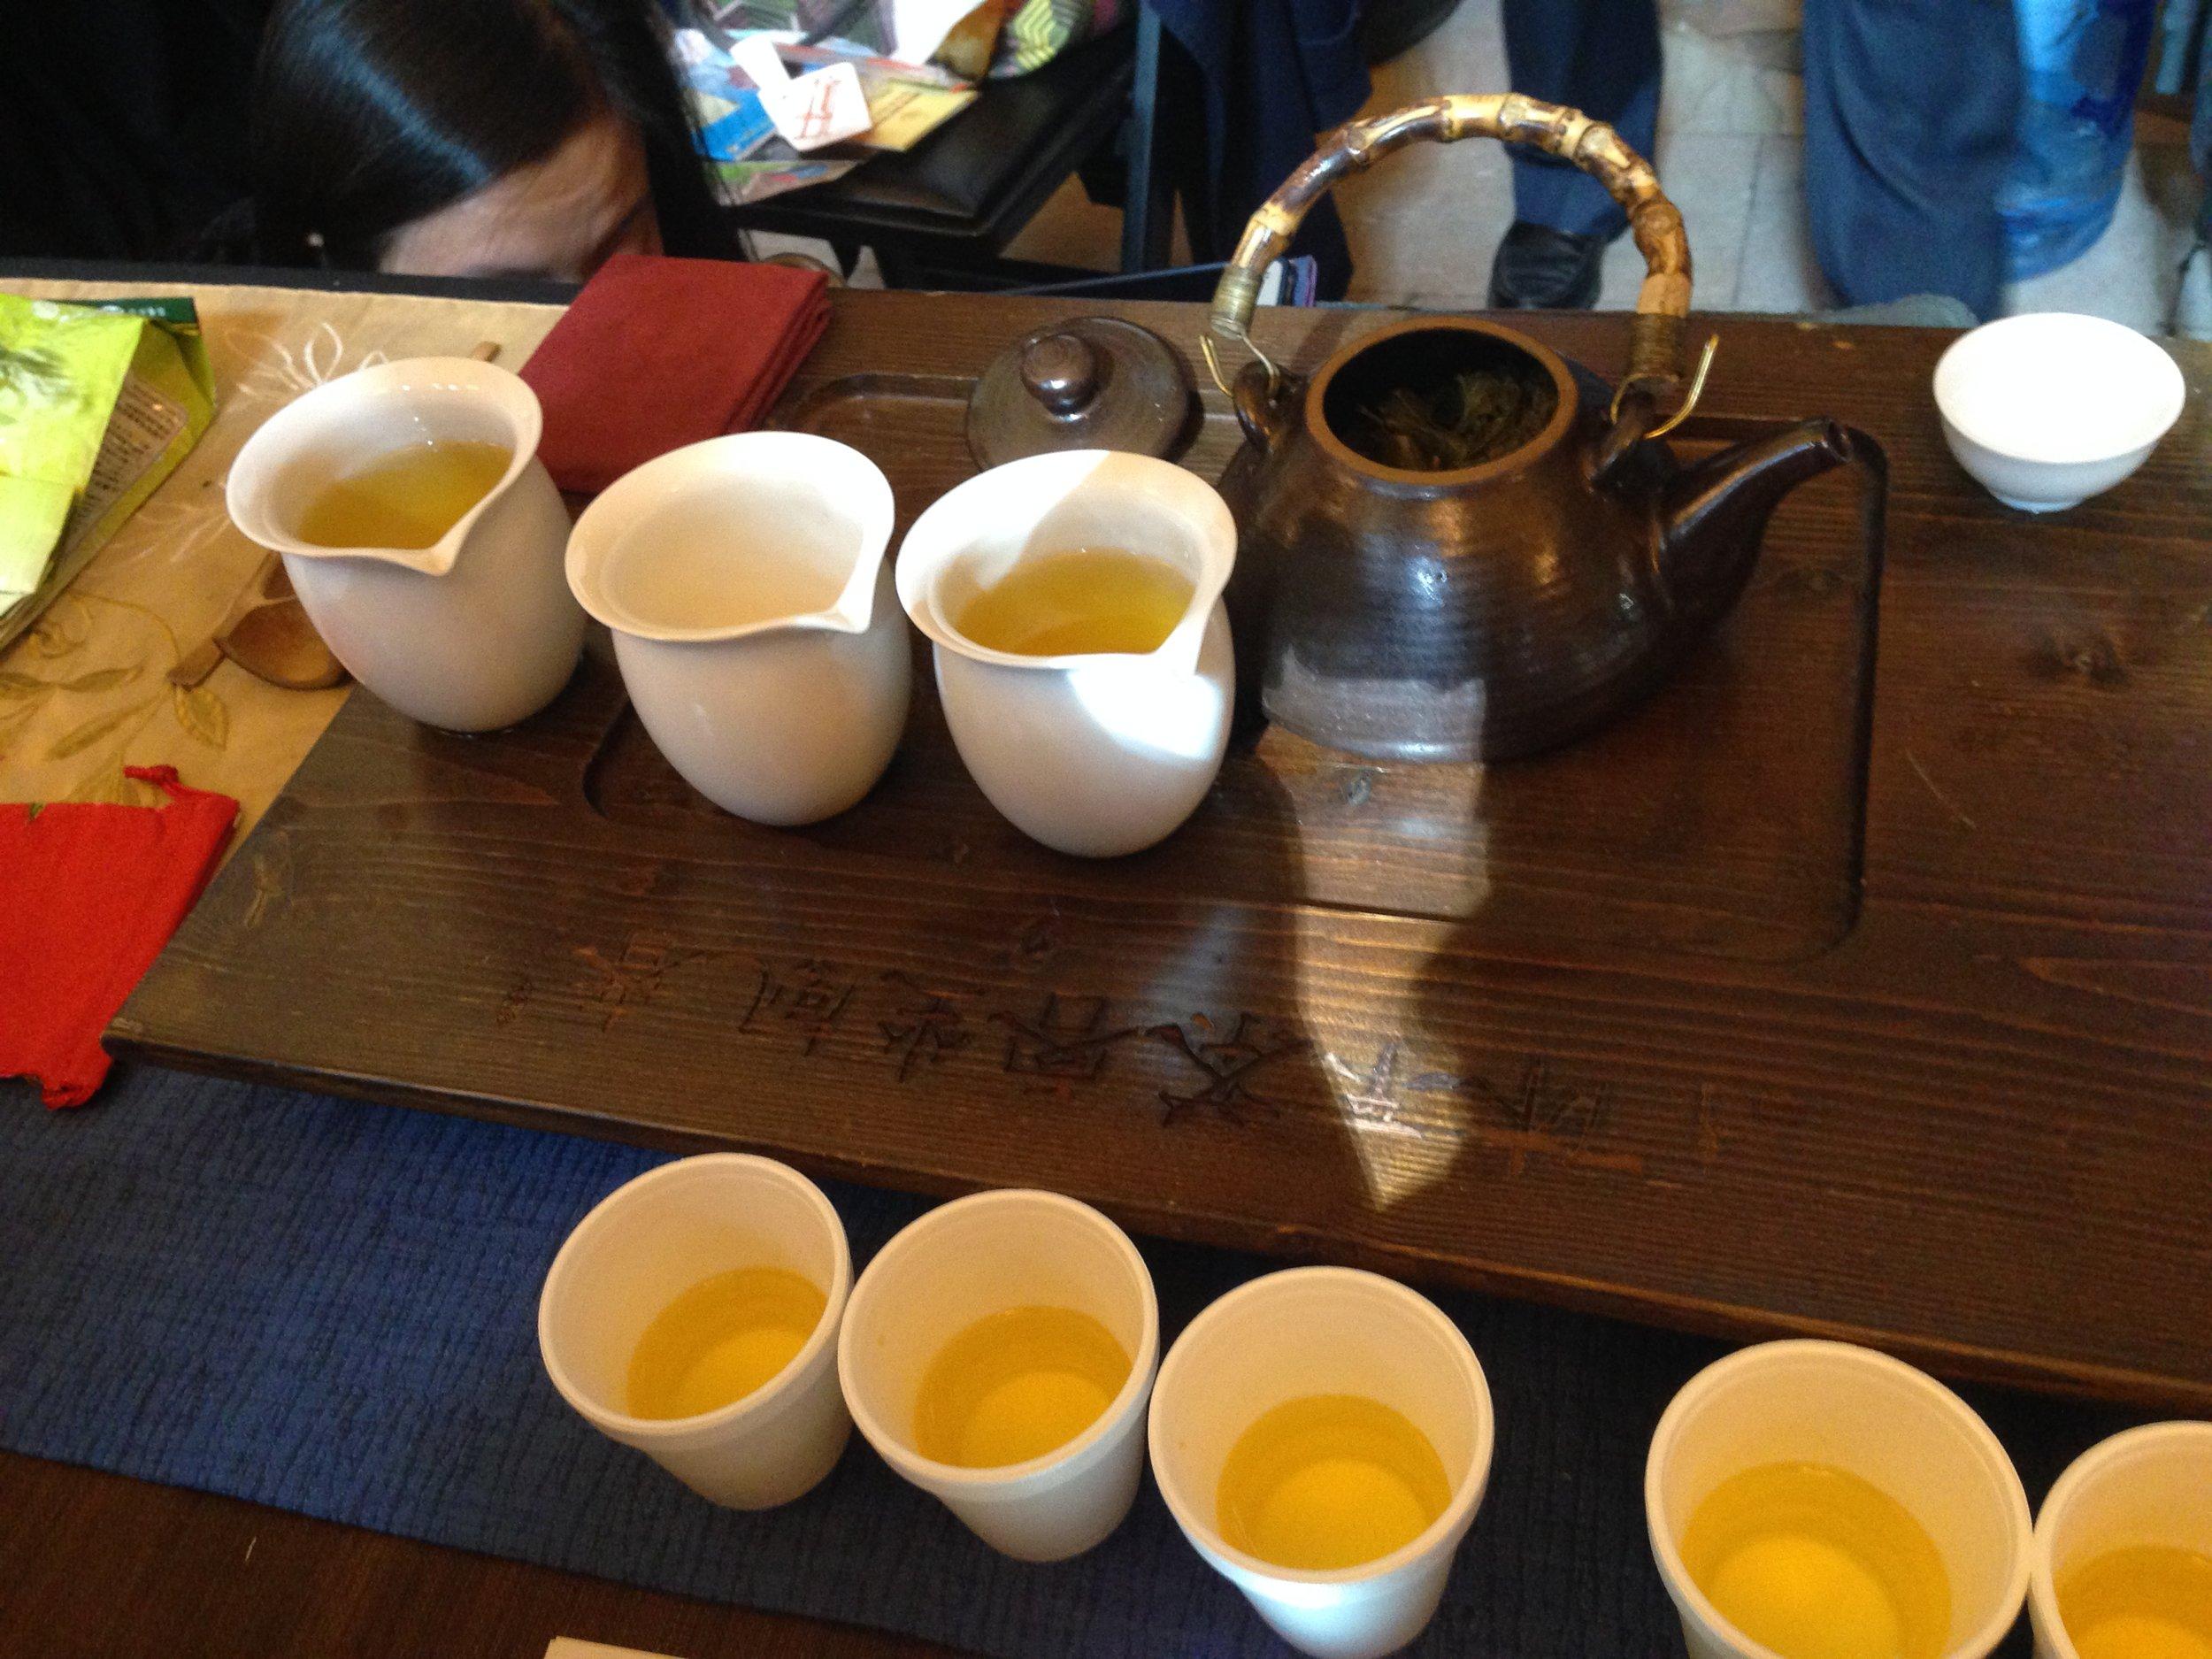 Samples of Taiwanese high mountain-grown oolong tea from  Fang Gourmet Tea .